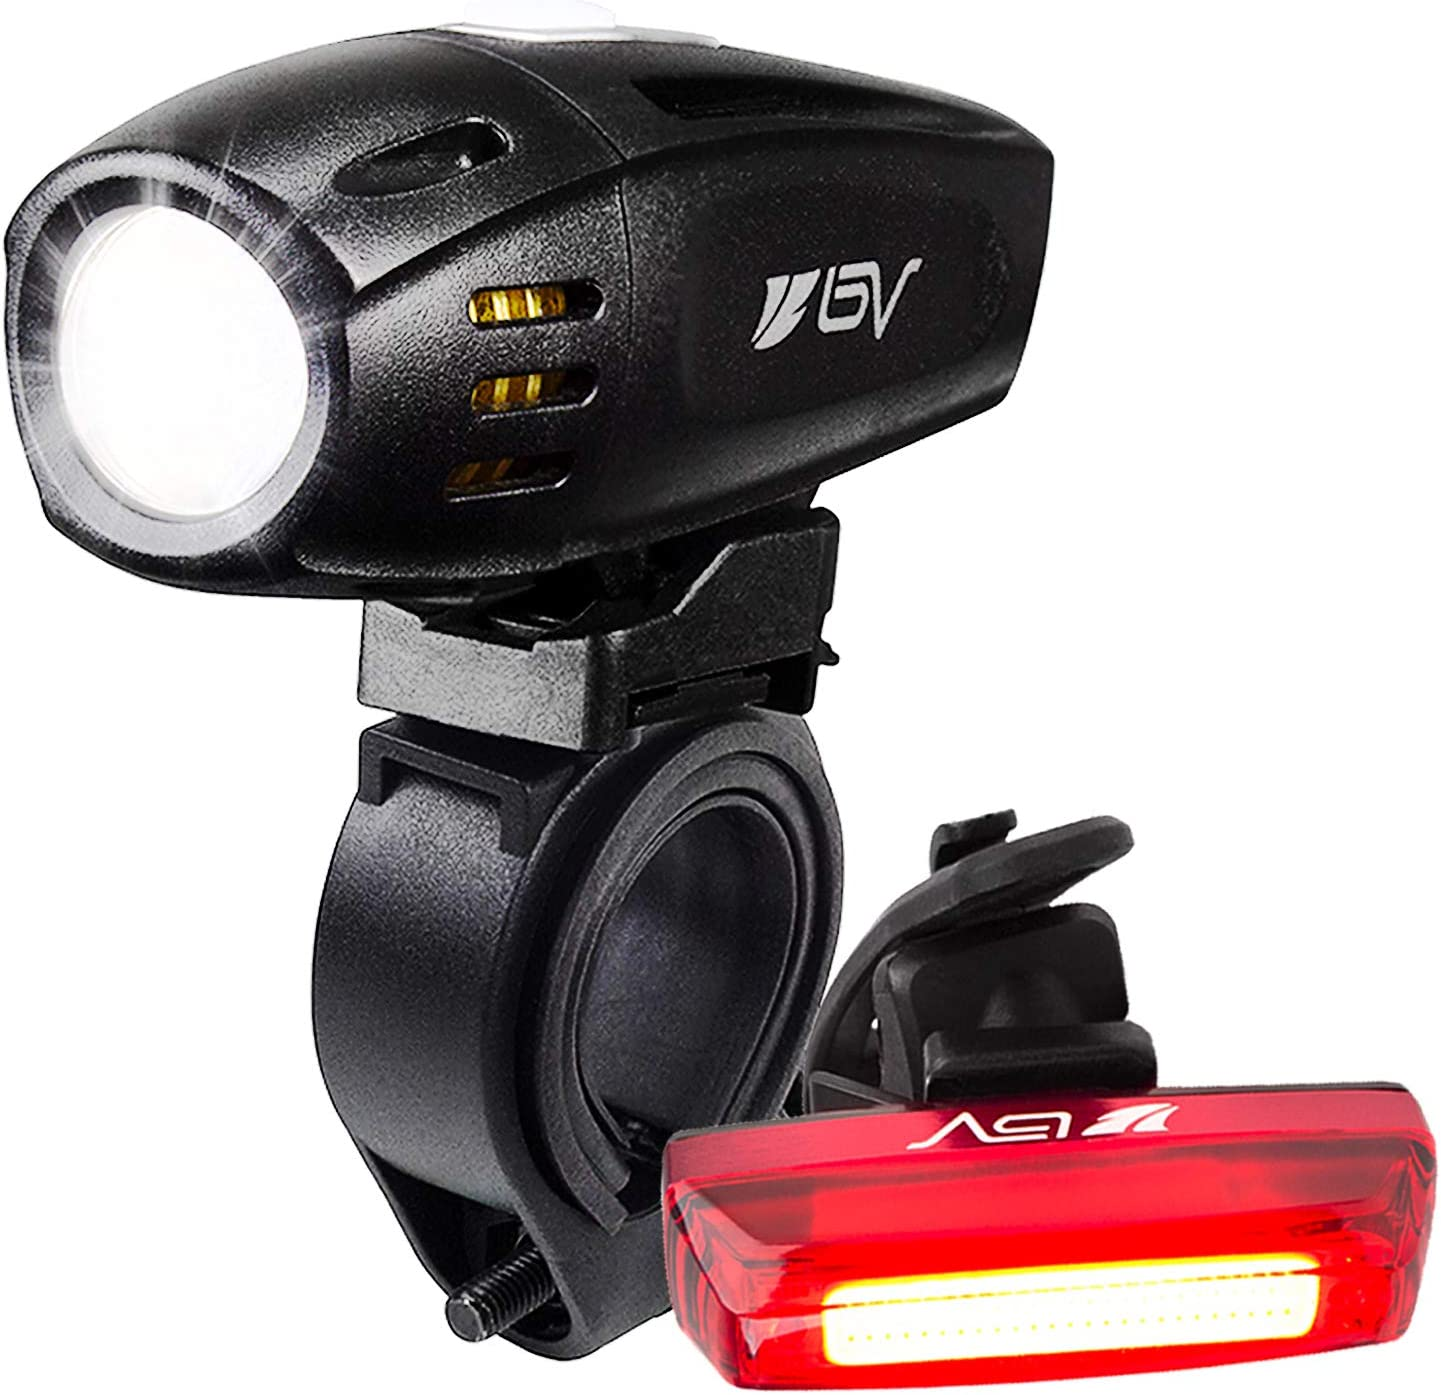 BV Sale item Super Bright USB Rechargeable Bike Headlight Light with Set Jacksonville Mall